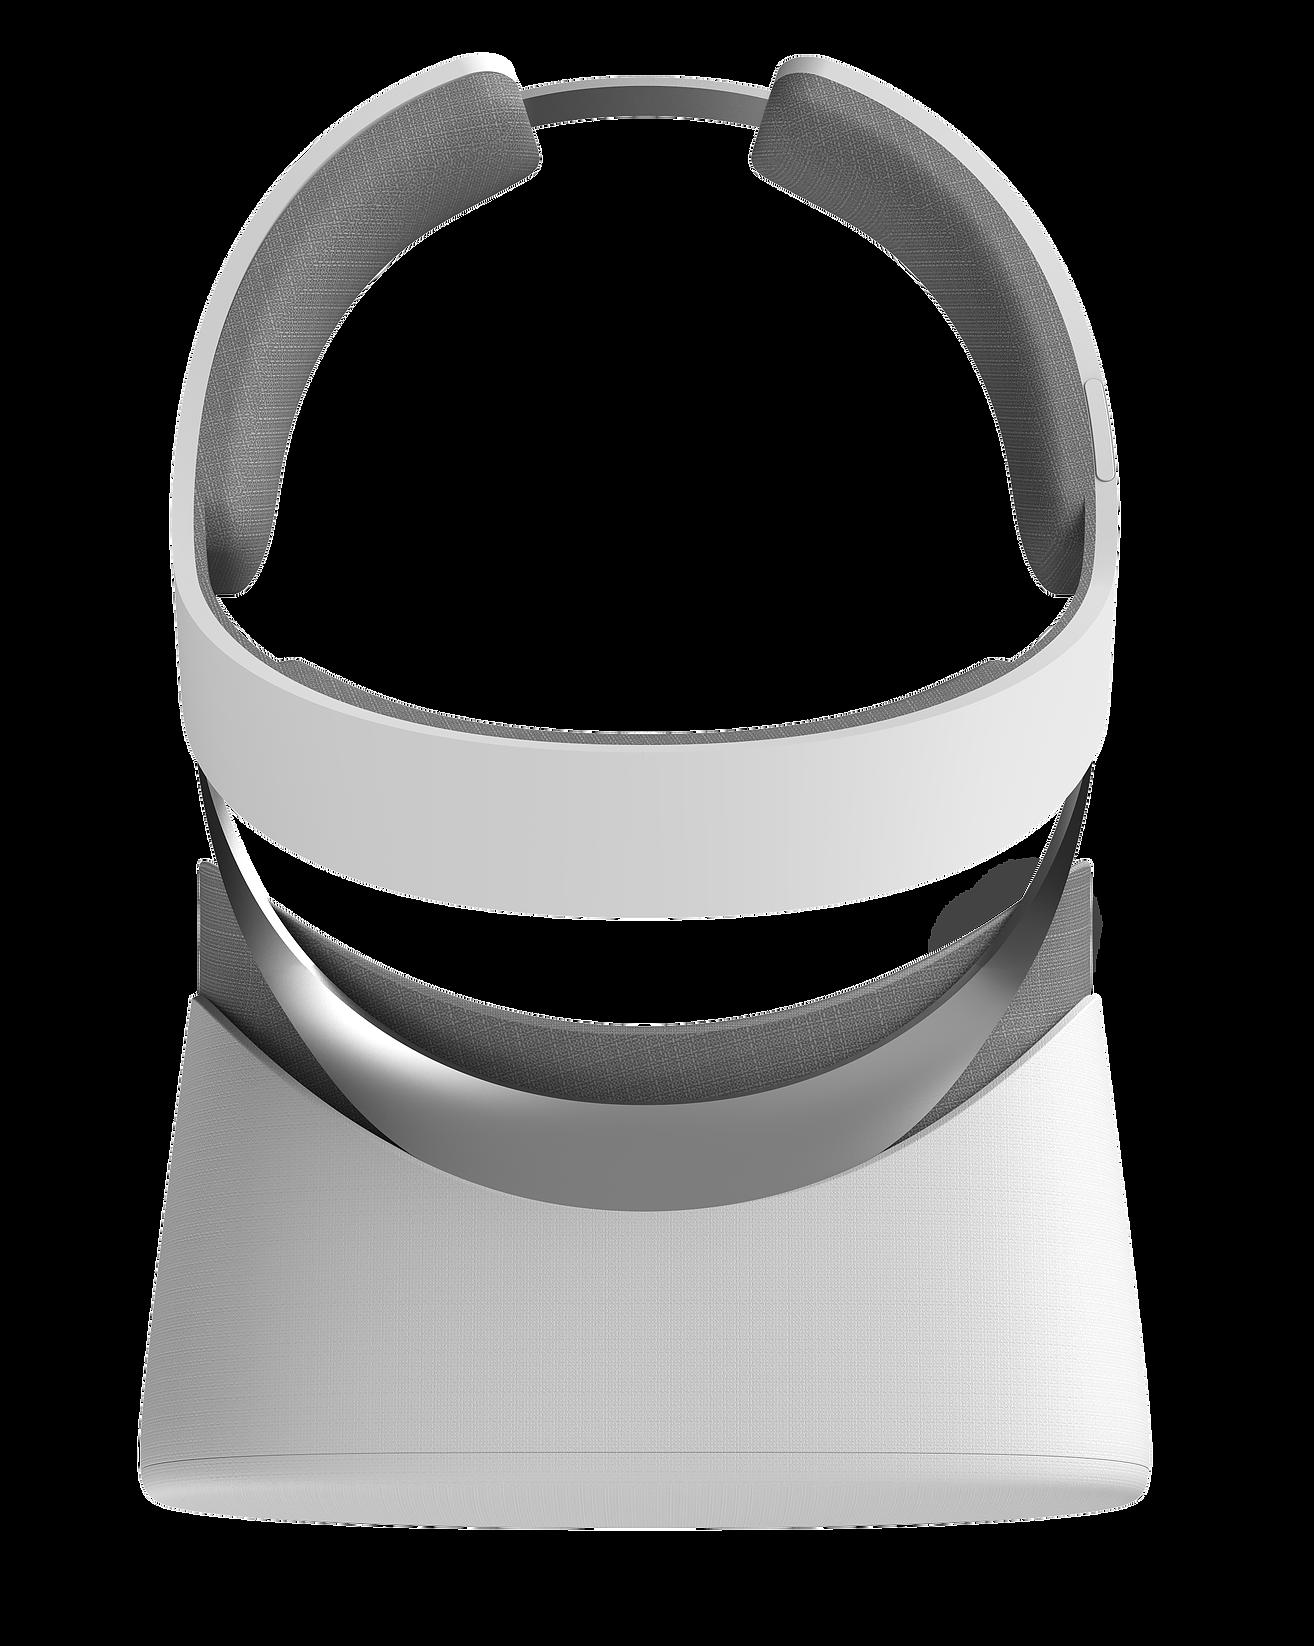 Pico Pico Neo Cv Wearable Device Wearable Tech Smart Glasses